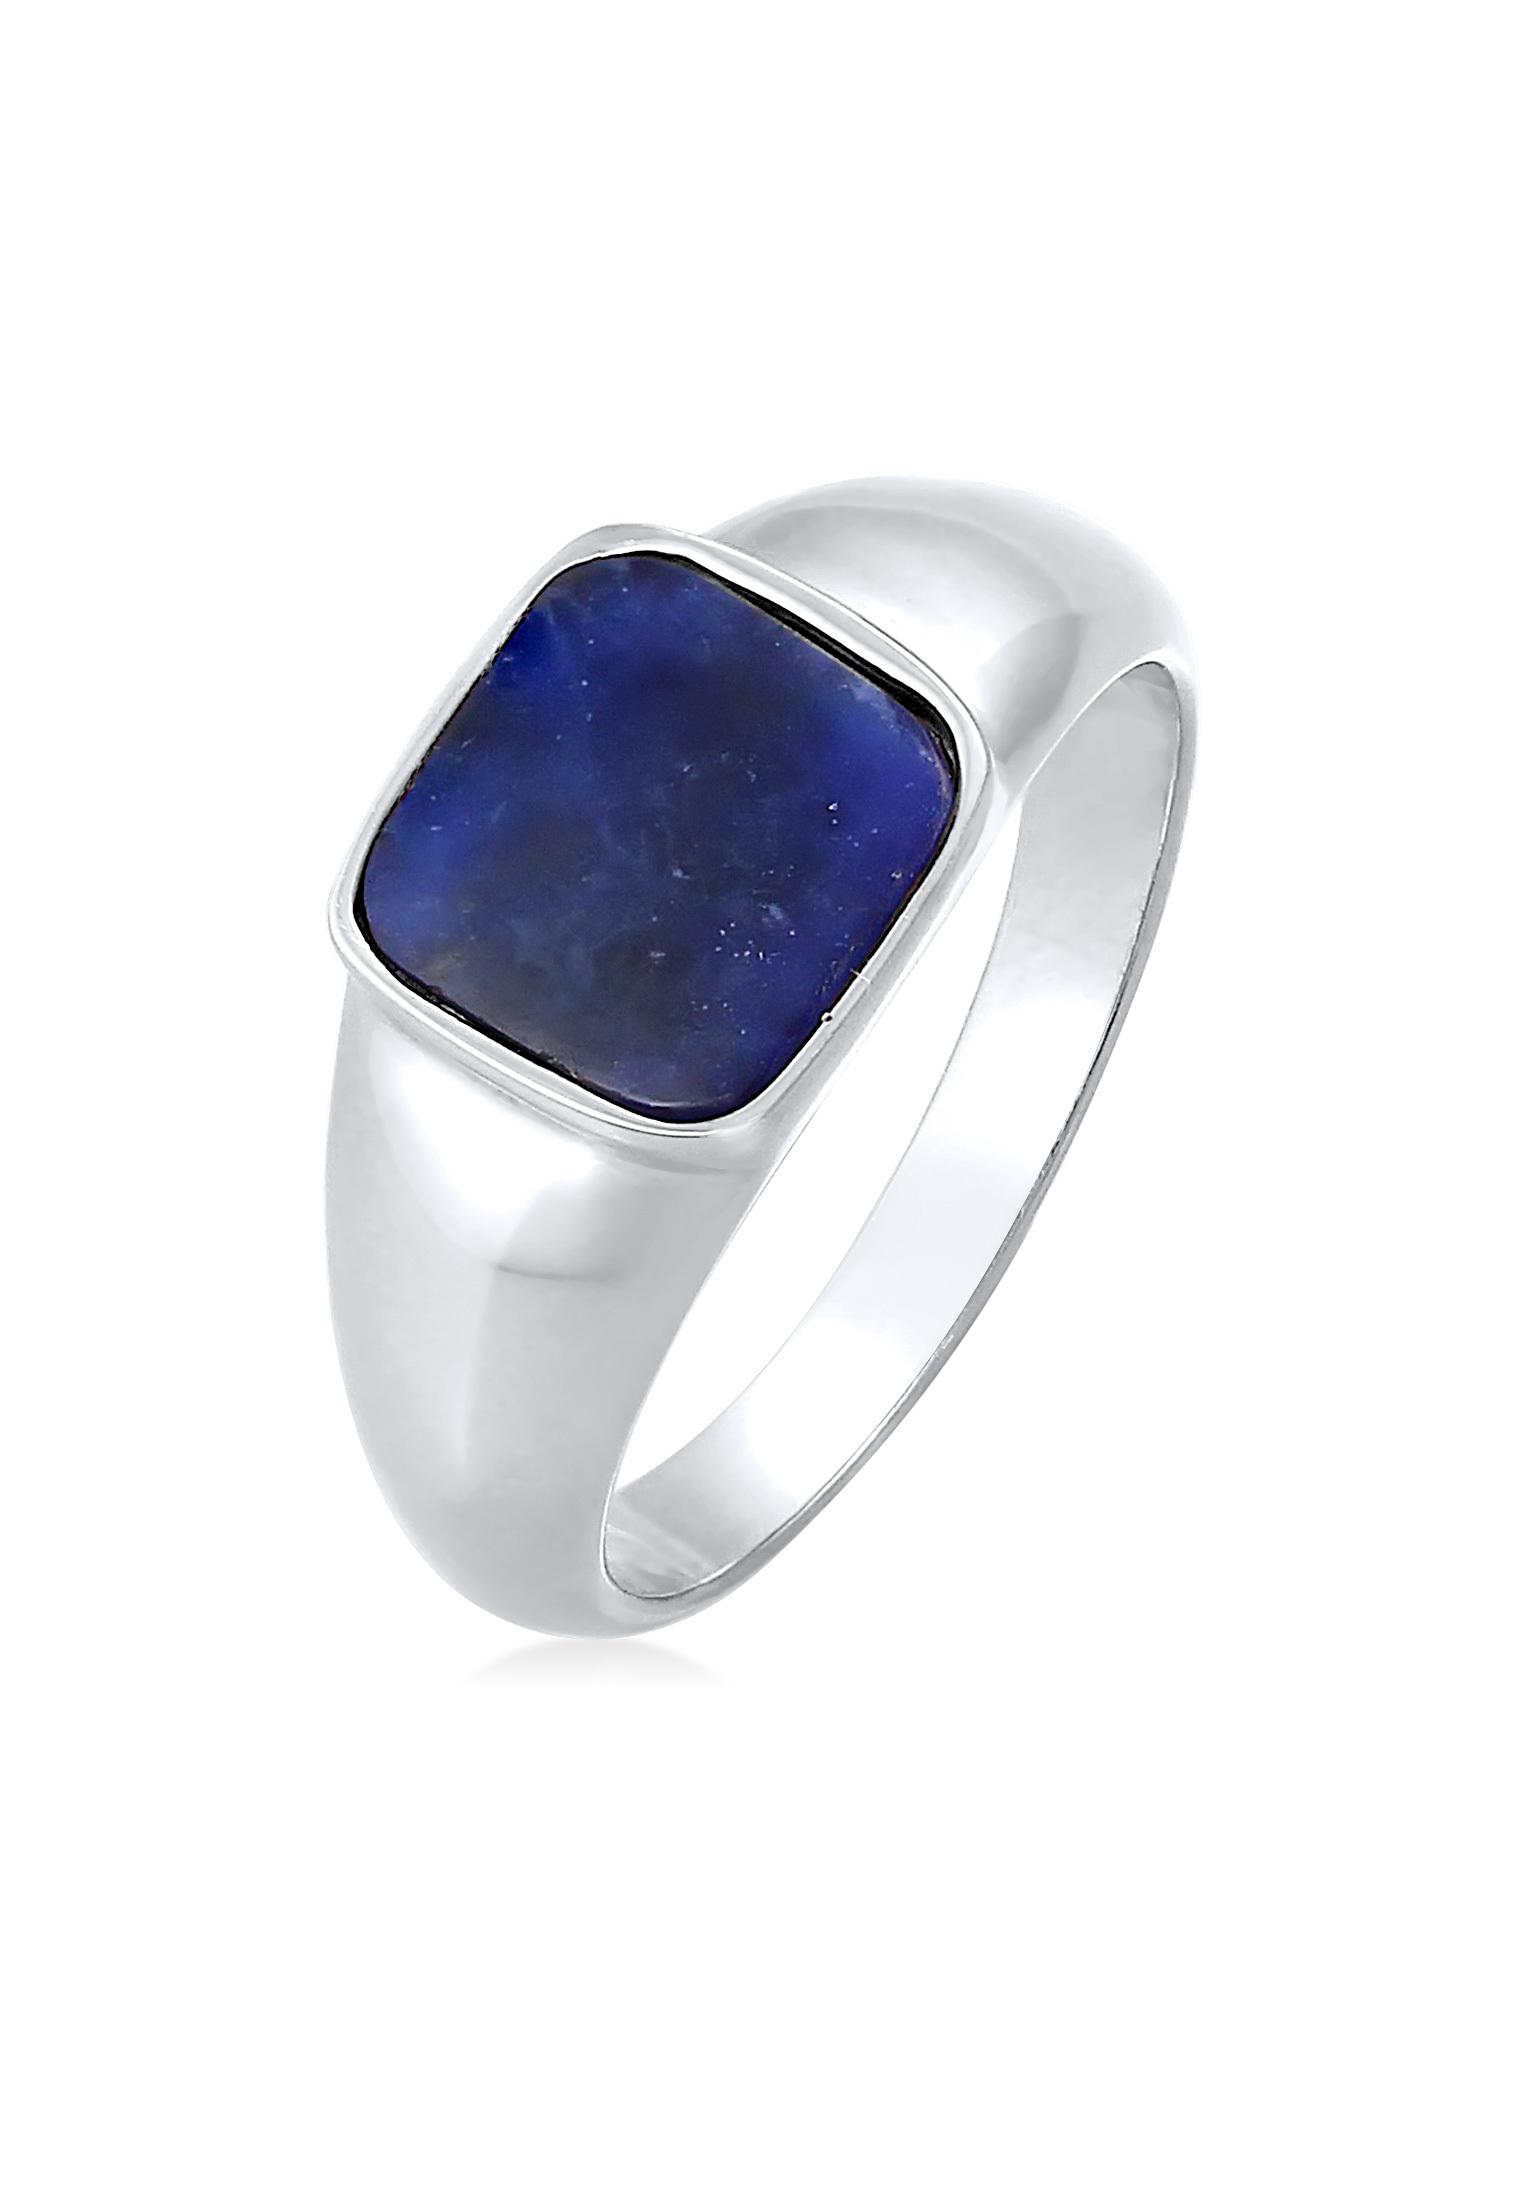 Siegelring | Sodalith (blau) | 925er Sterling Silber